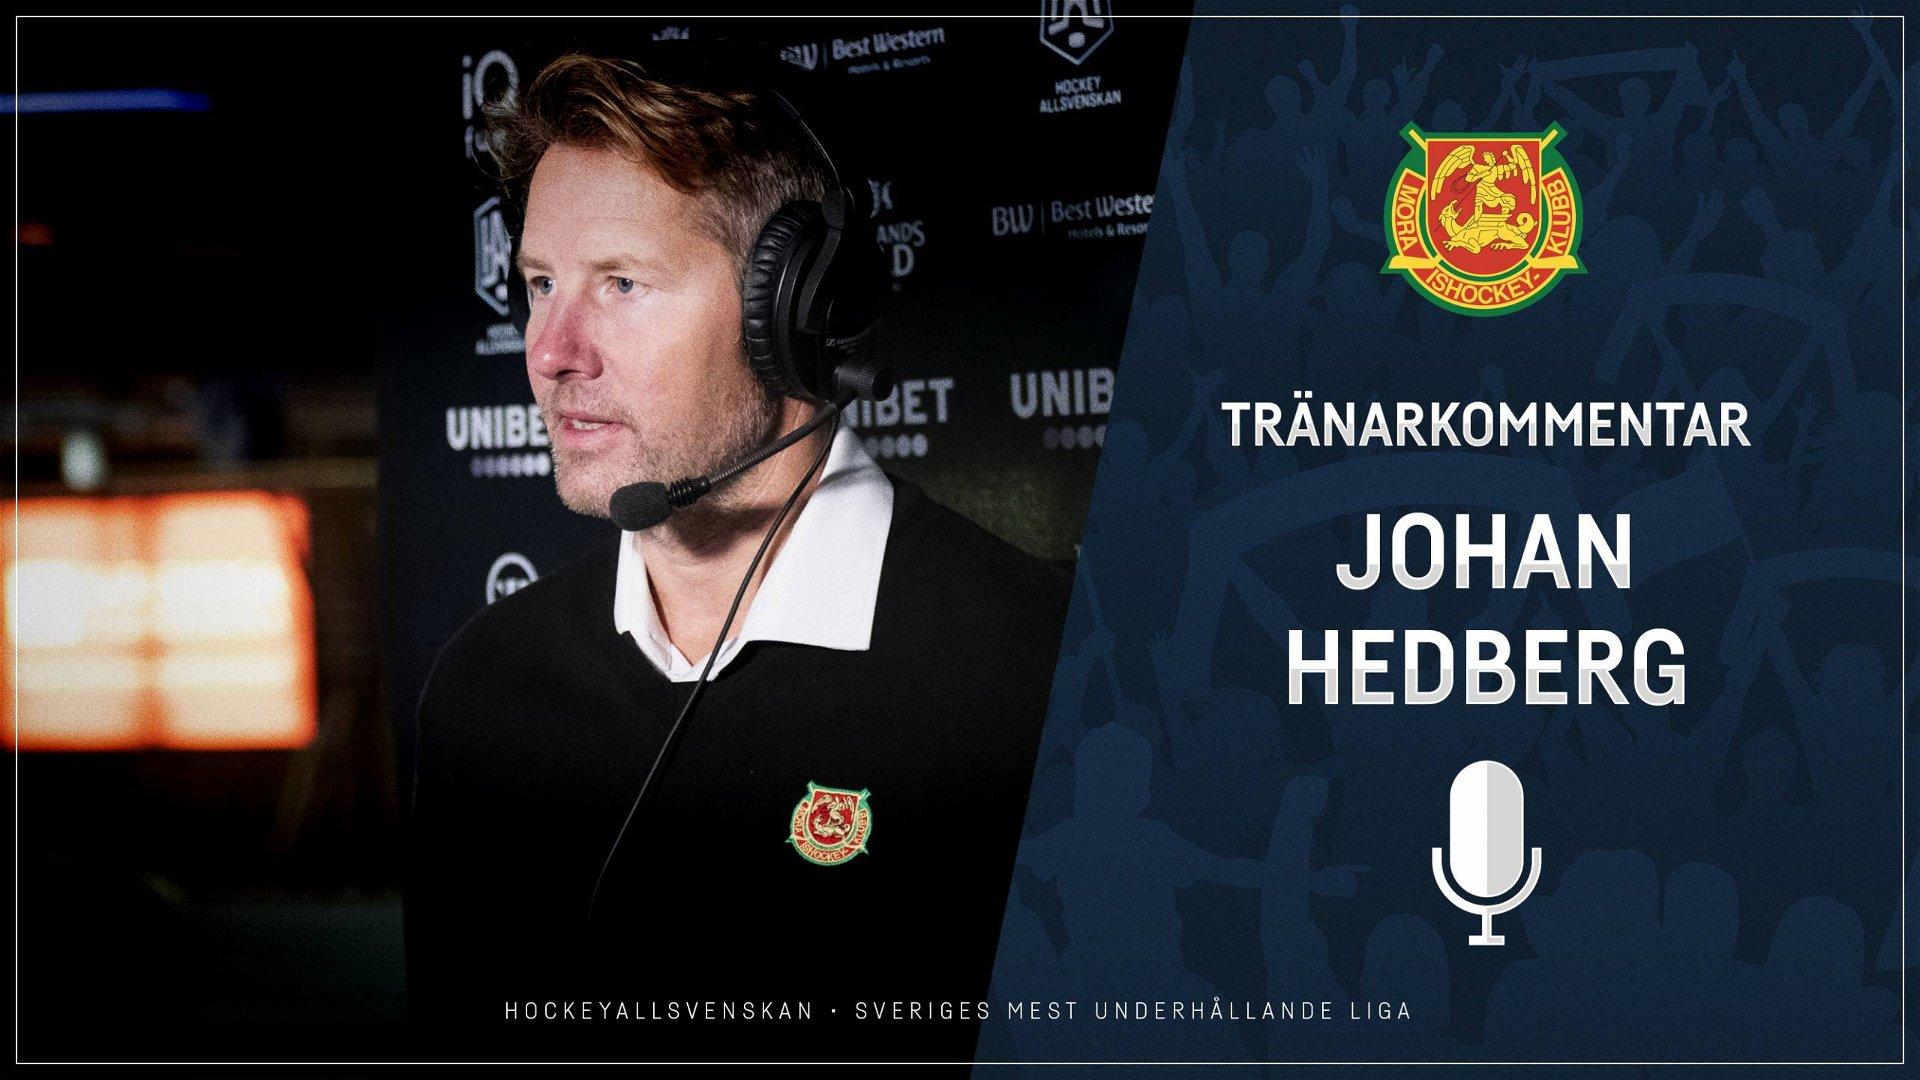 2020-11-08 Segerintervju: Johan Hedberg